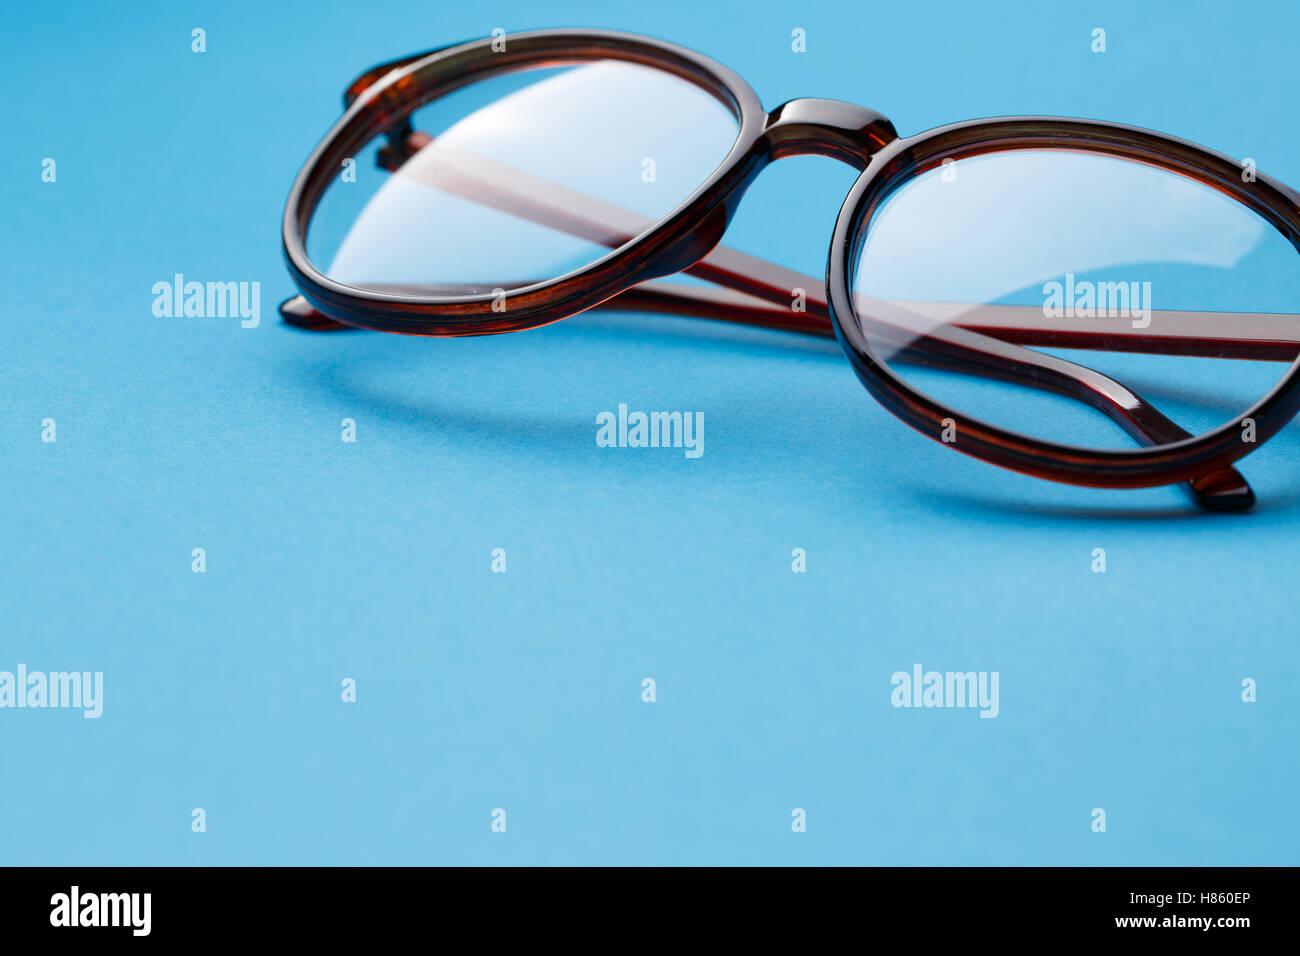 00f6ecbad3389 Round Glasses Stock Photos   Round Glasses Stock Images - Alamy